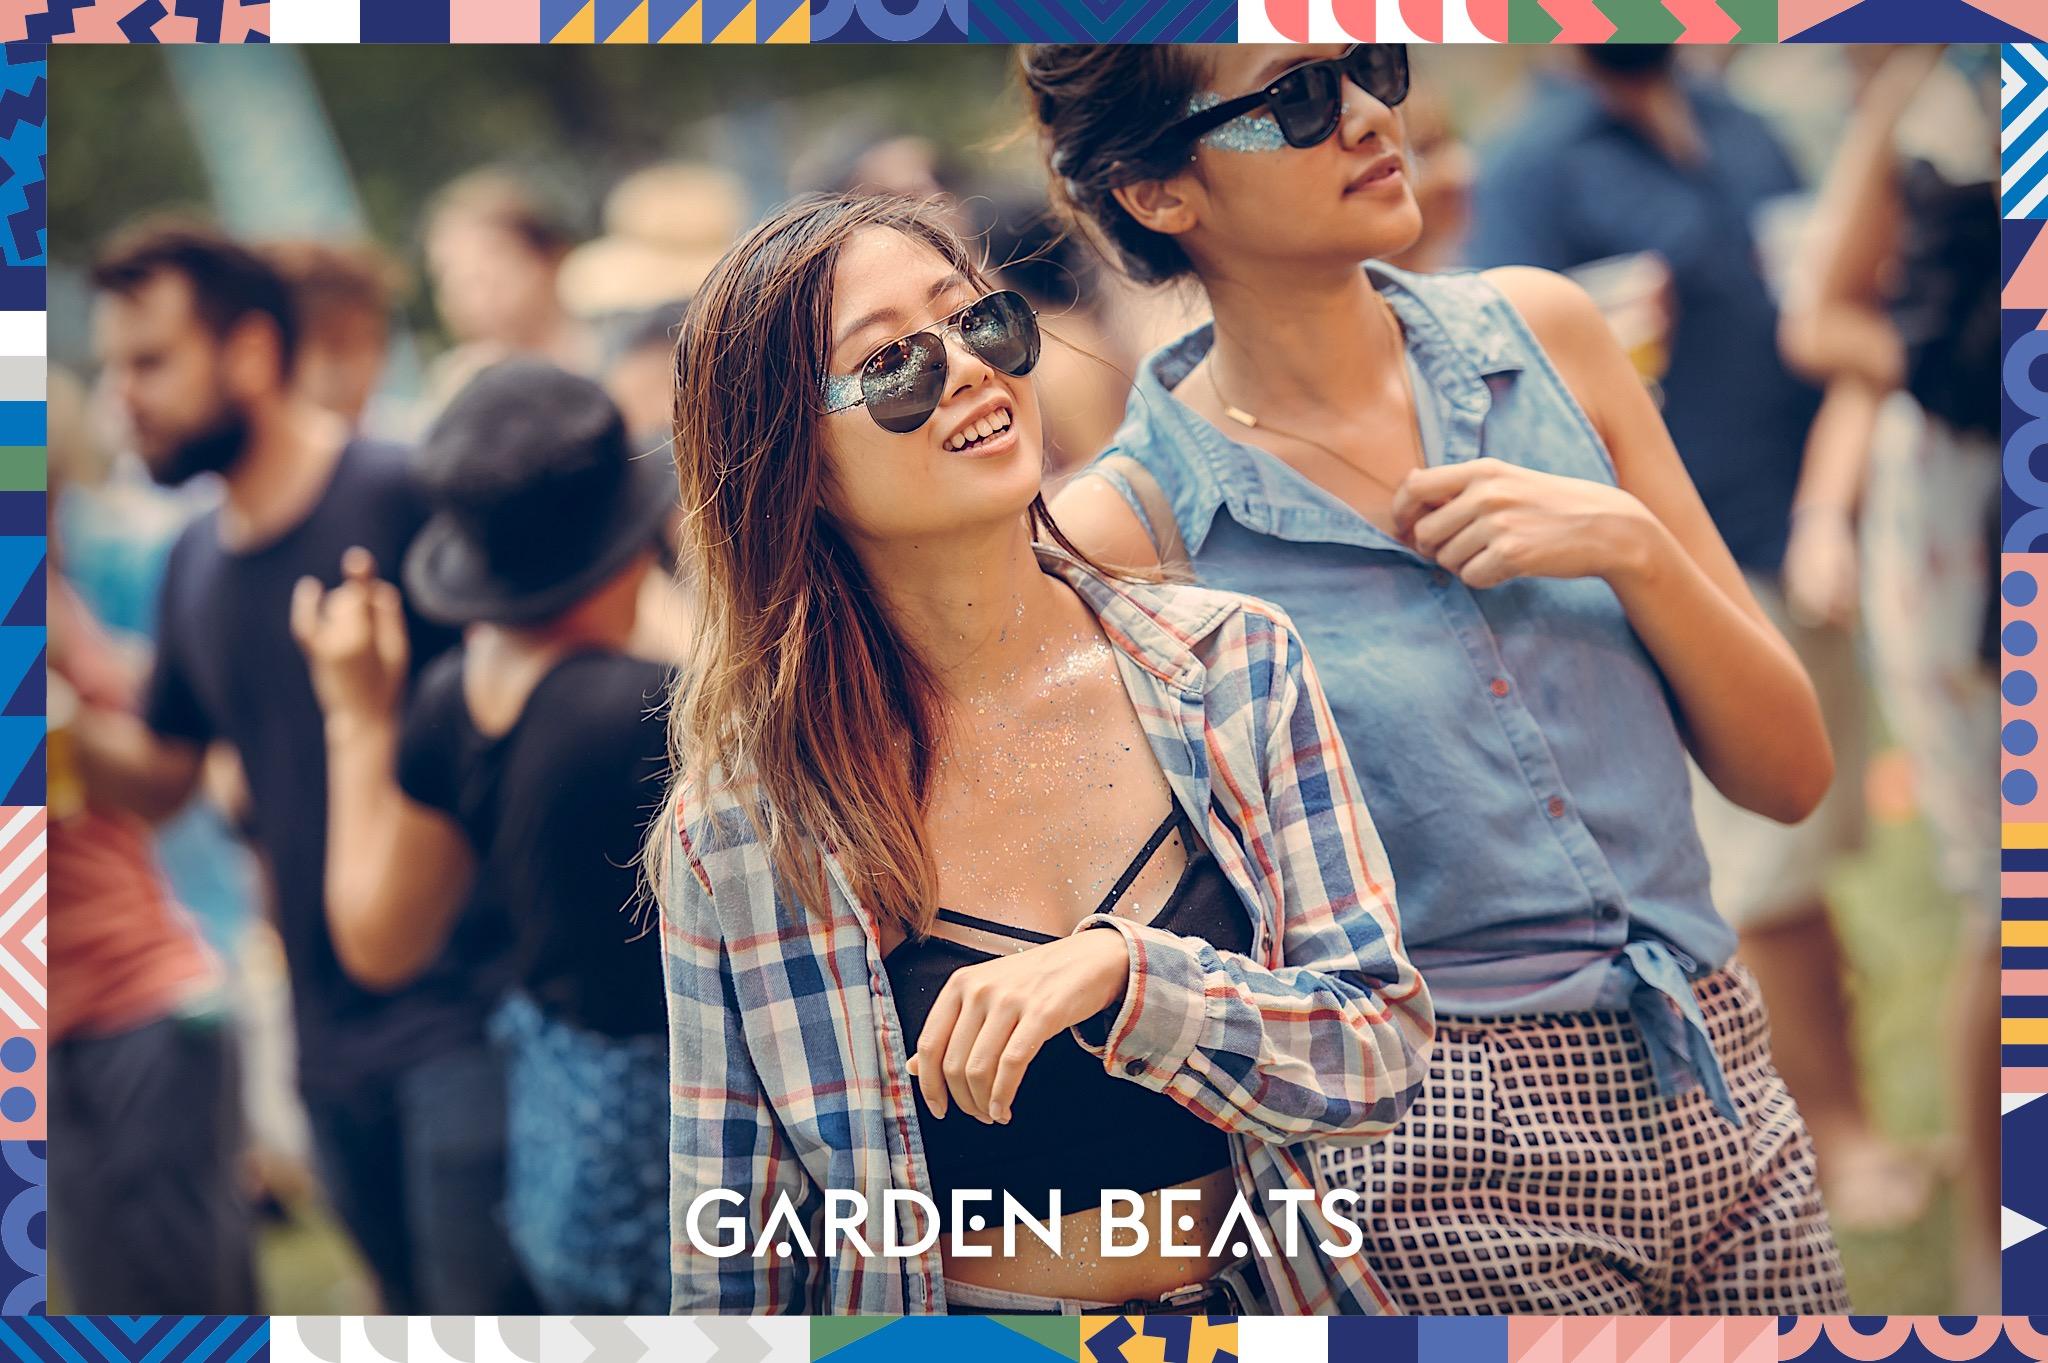 03032018_GardenBeats_Colossal553_Watermarked.jpg